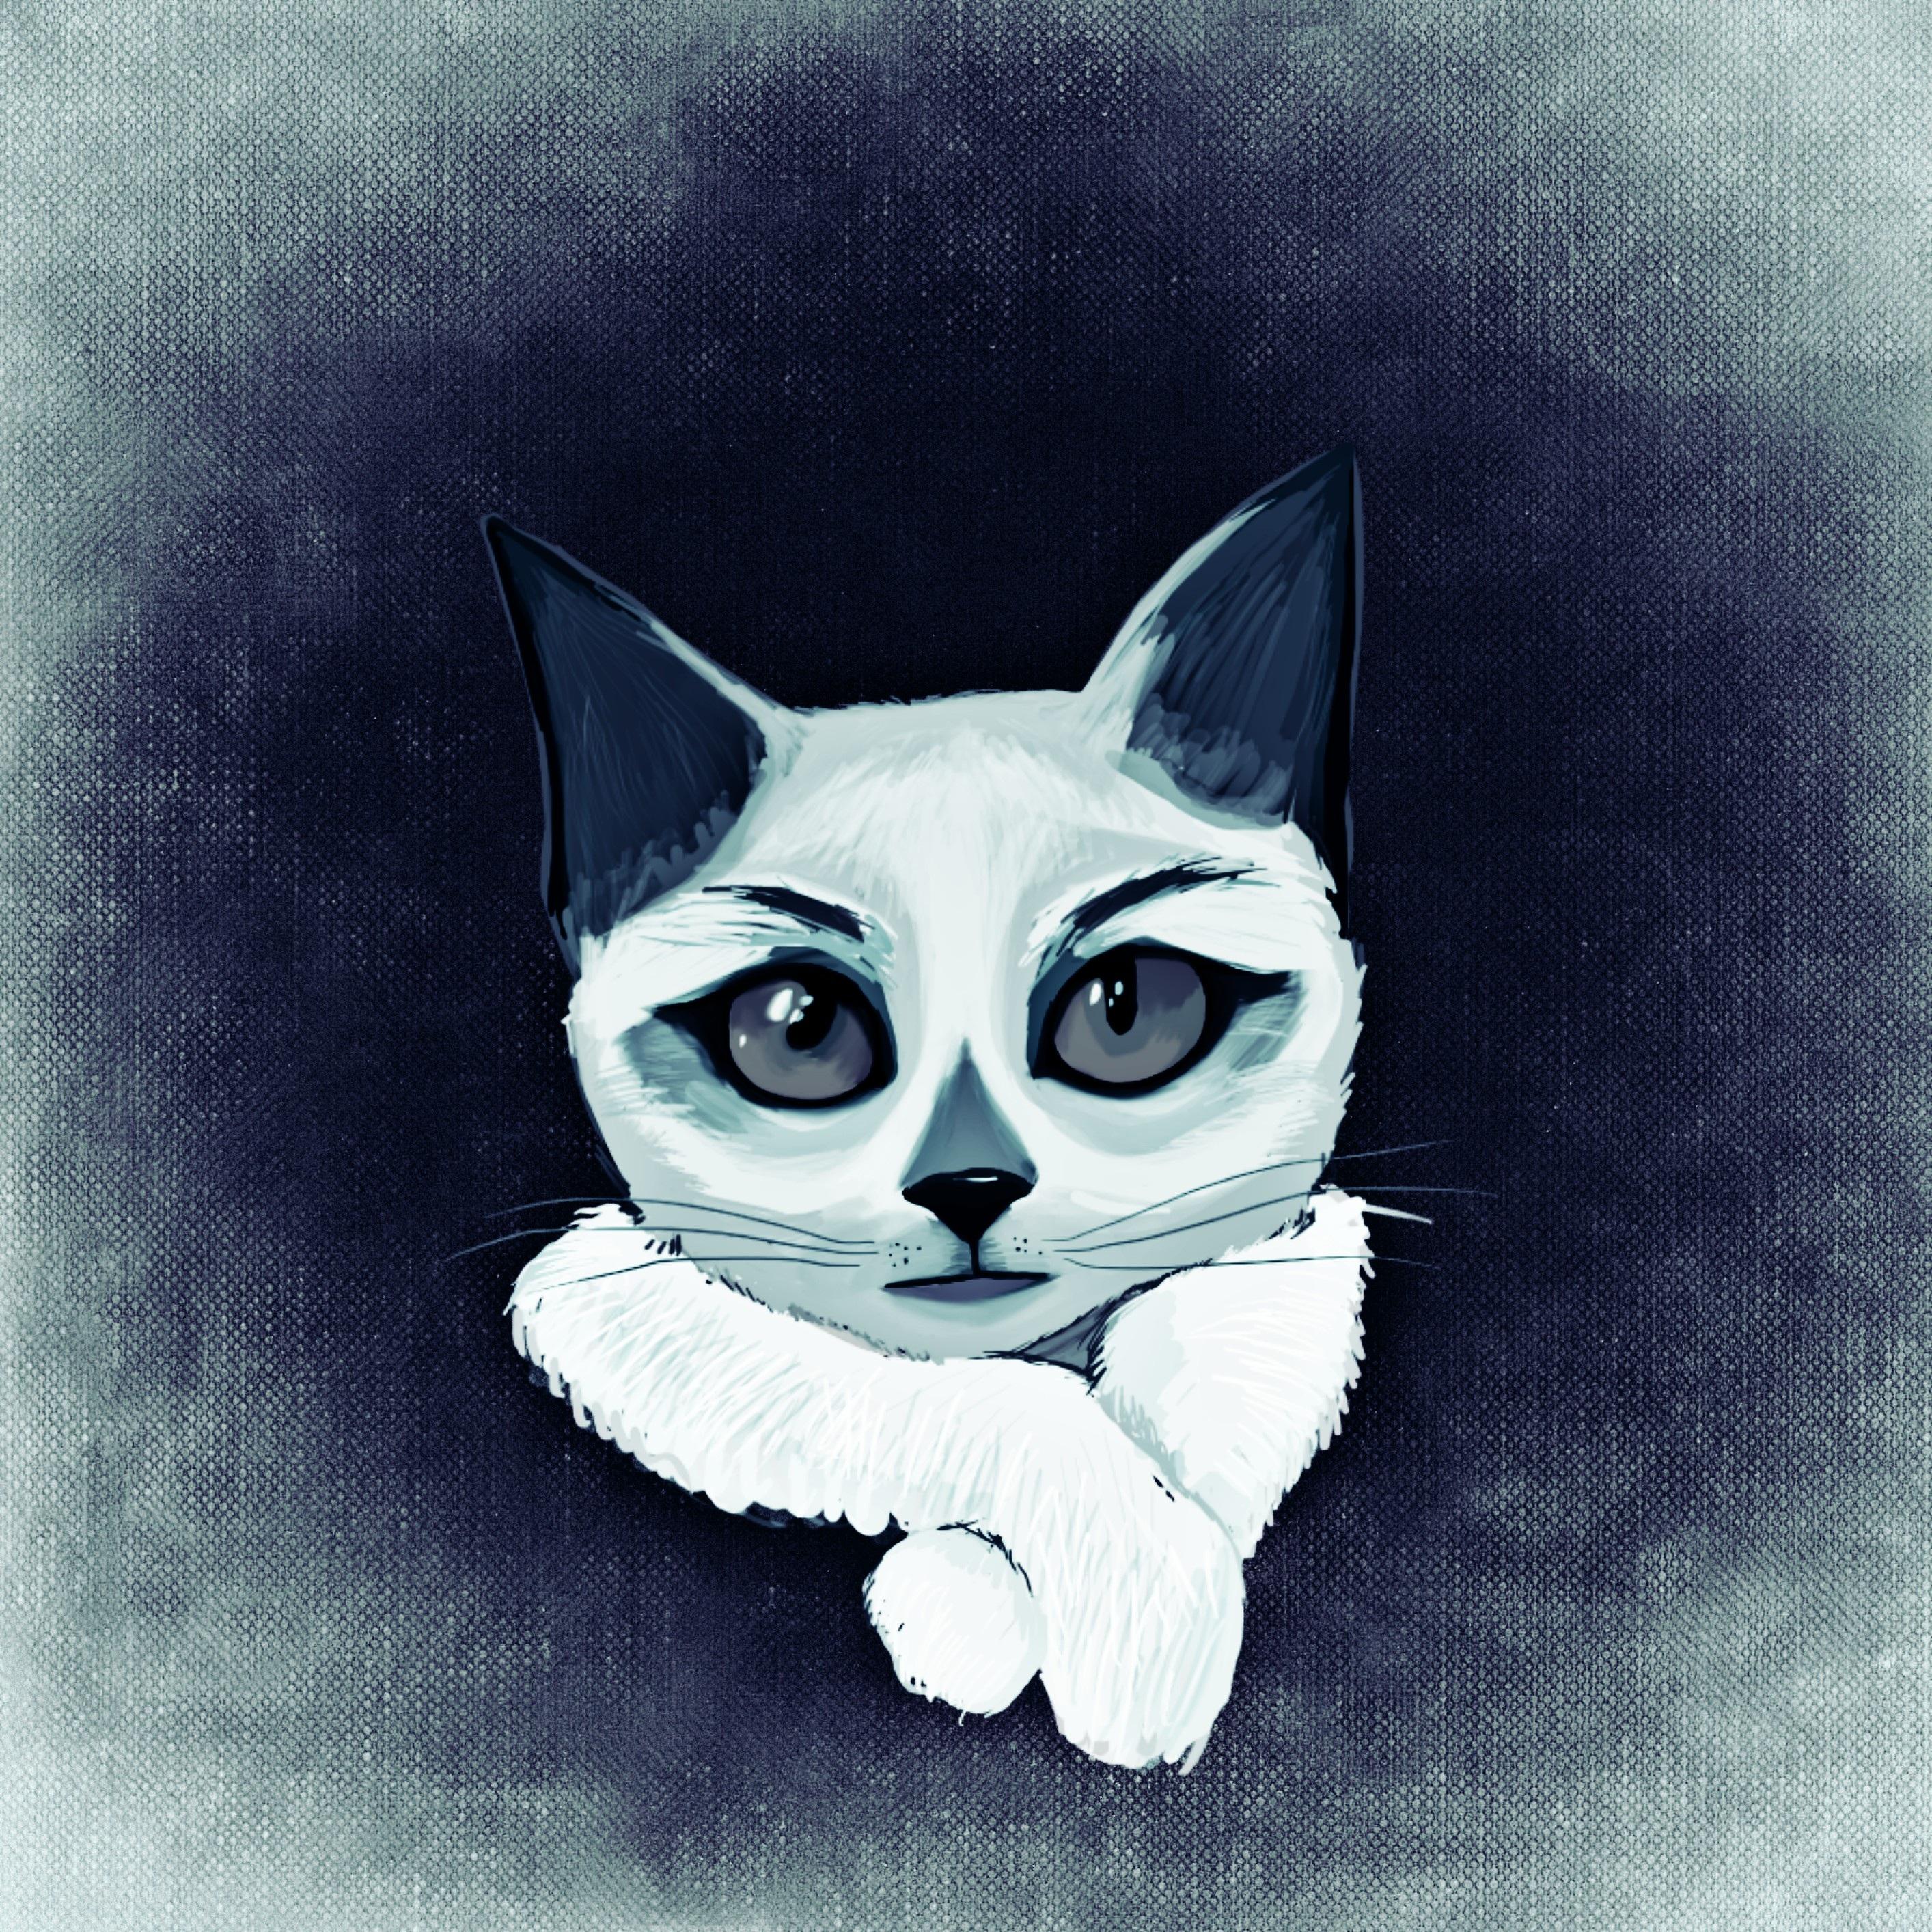 Gambar Hitam Dan Putih Hewan Kucing Hitam Sketsa Ilustrasi Lucu Mieze Kucing Domestik Gambar Kartun Fotografi Monokrom Kecil Untuk Kucing Berukuran Sedang Kucing Seperti Mamalia 2828x2828 708756 Galeri Foto Pxhere